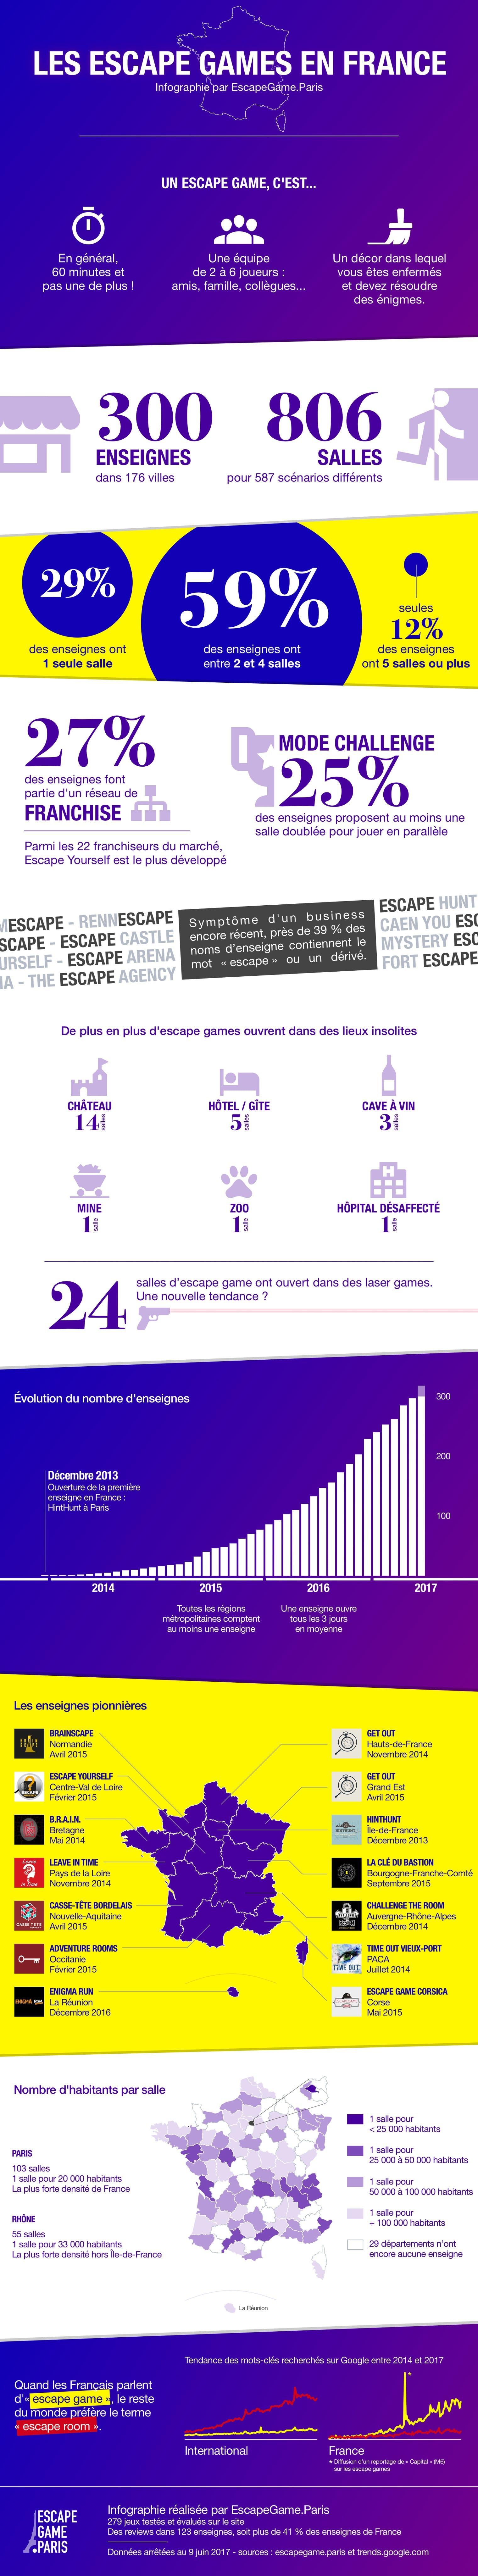 Infographie escape game 2013-2017